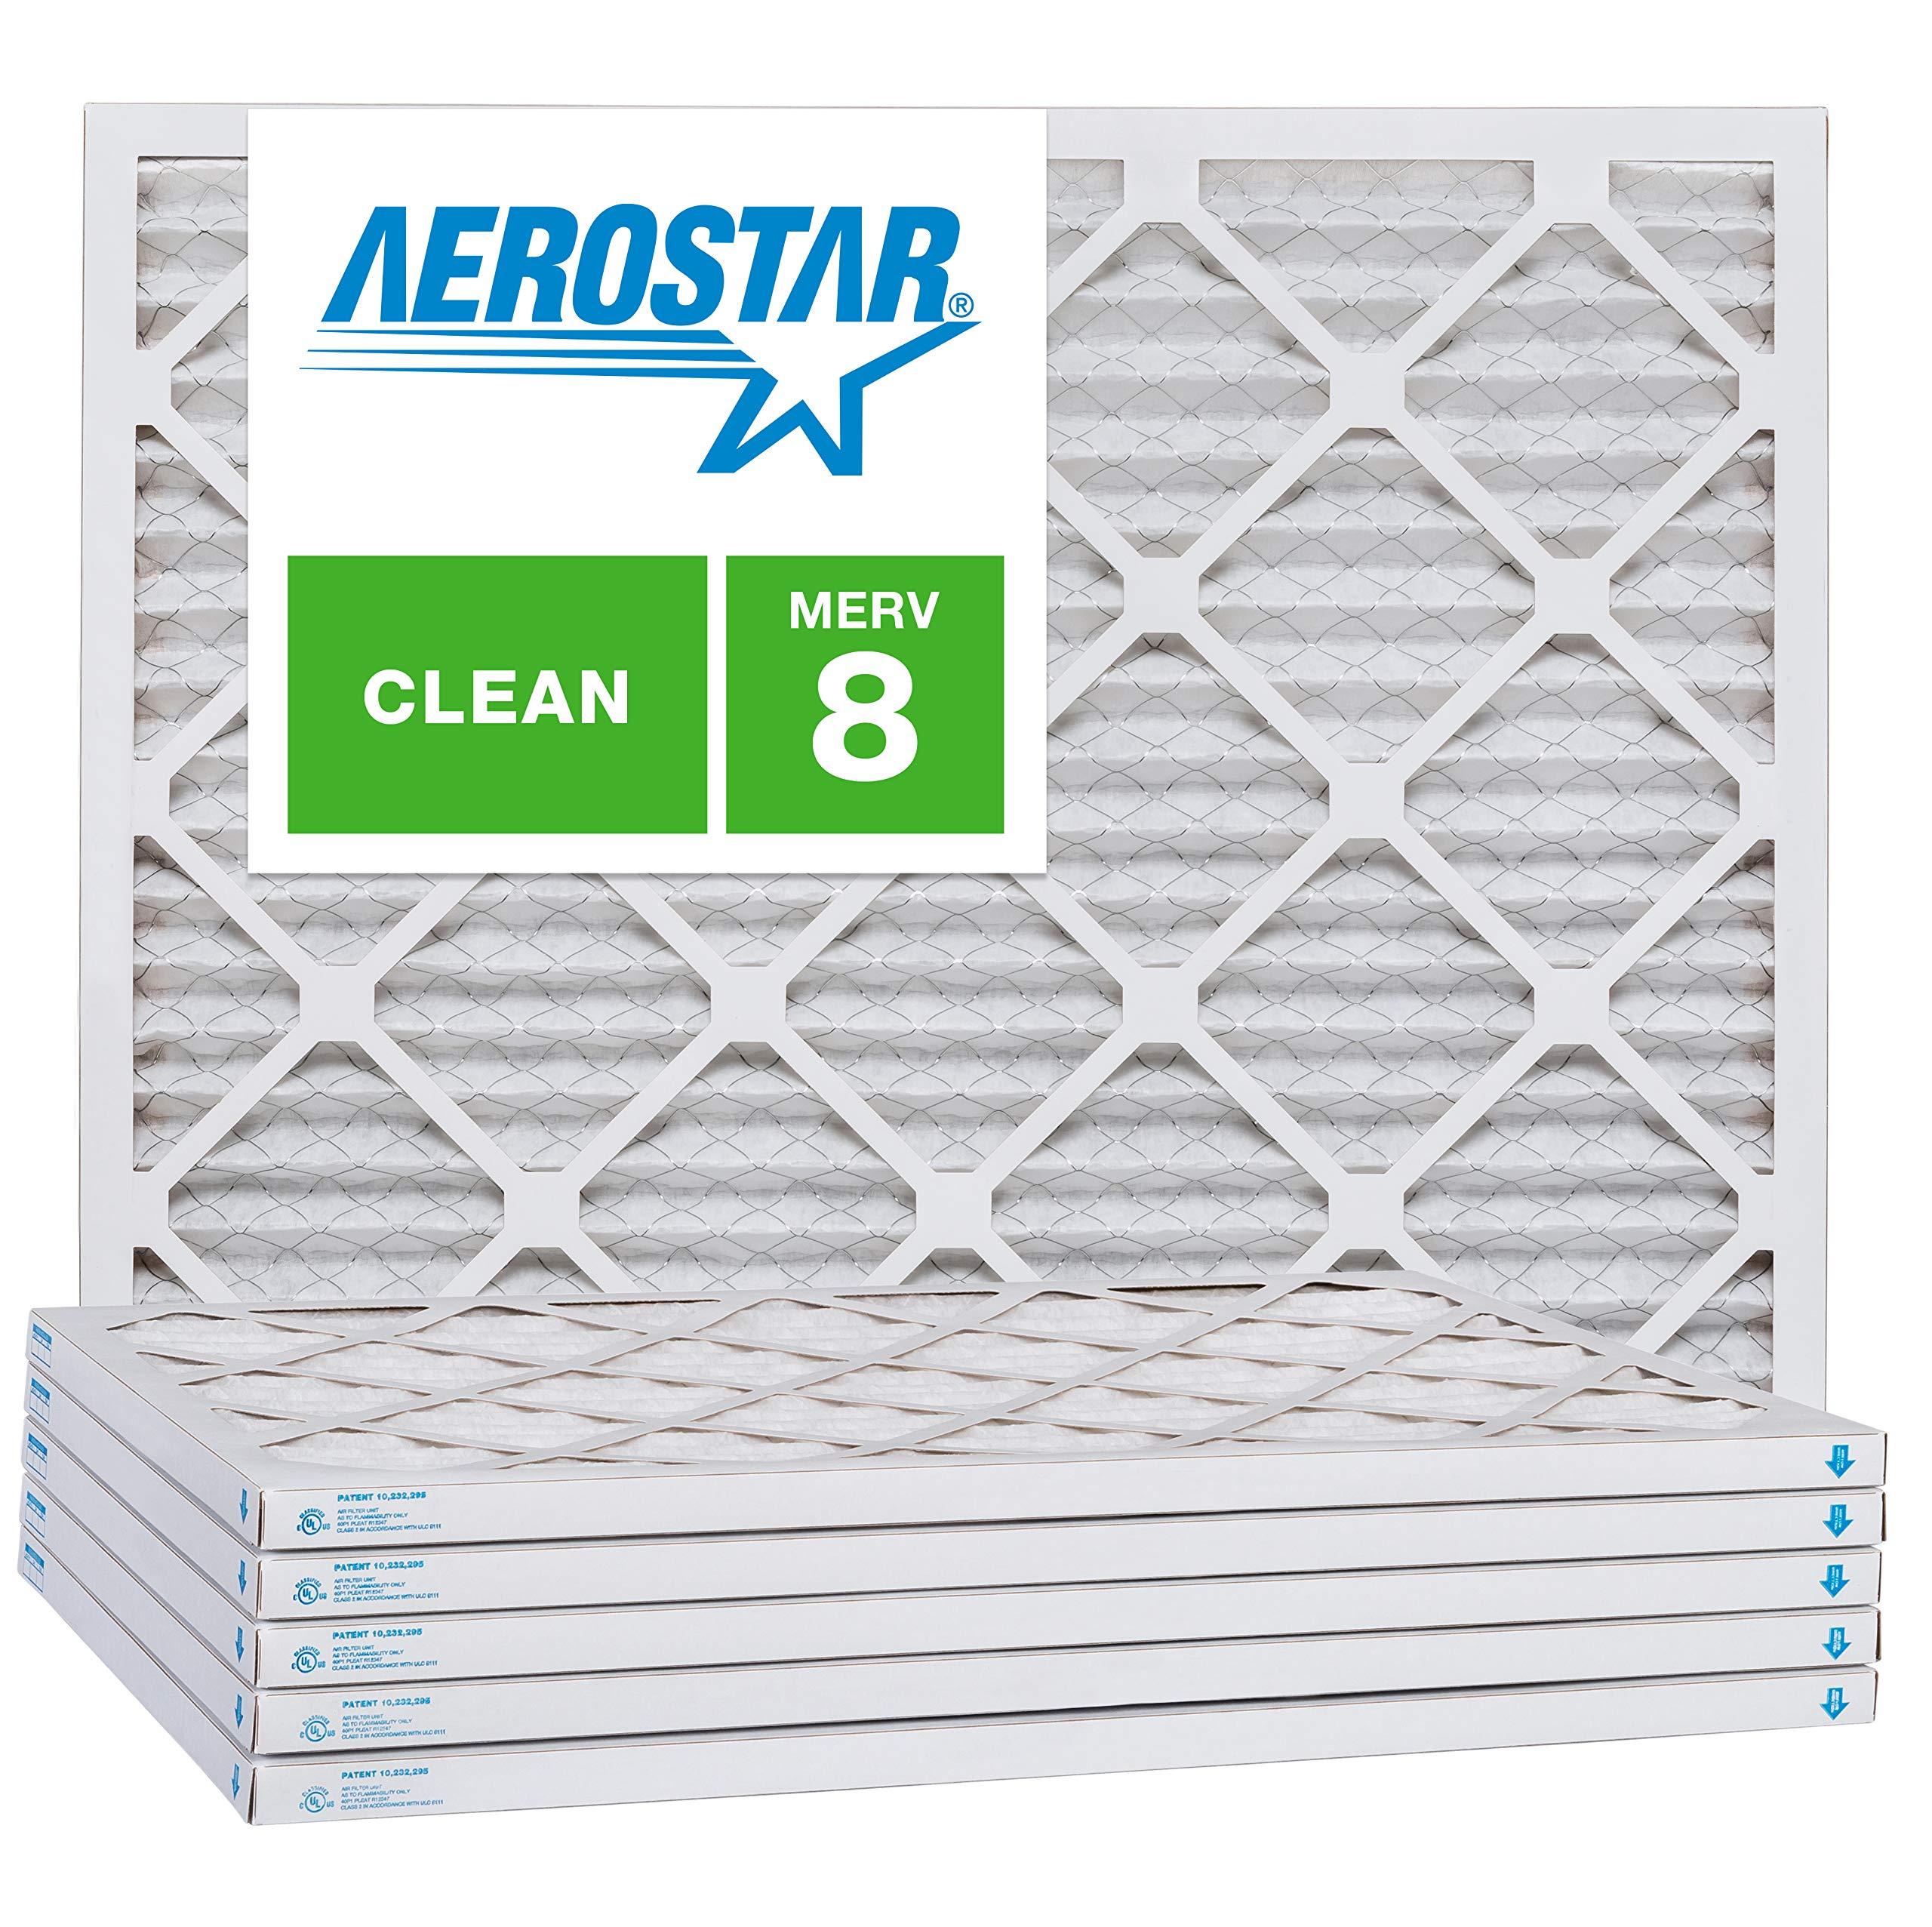 Aerostar 16 1/4x21 1/2x1 MERV 8, Pleated Air Filter, 16 1/4x21 1/2x1, Box of 6, Made in The USA